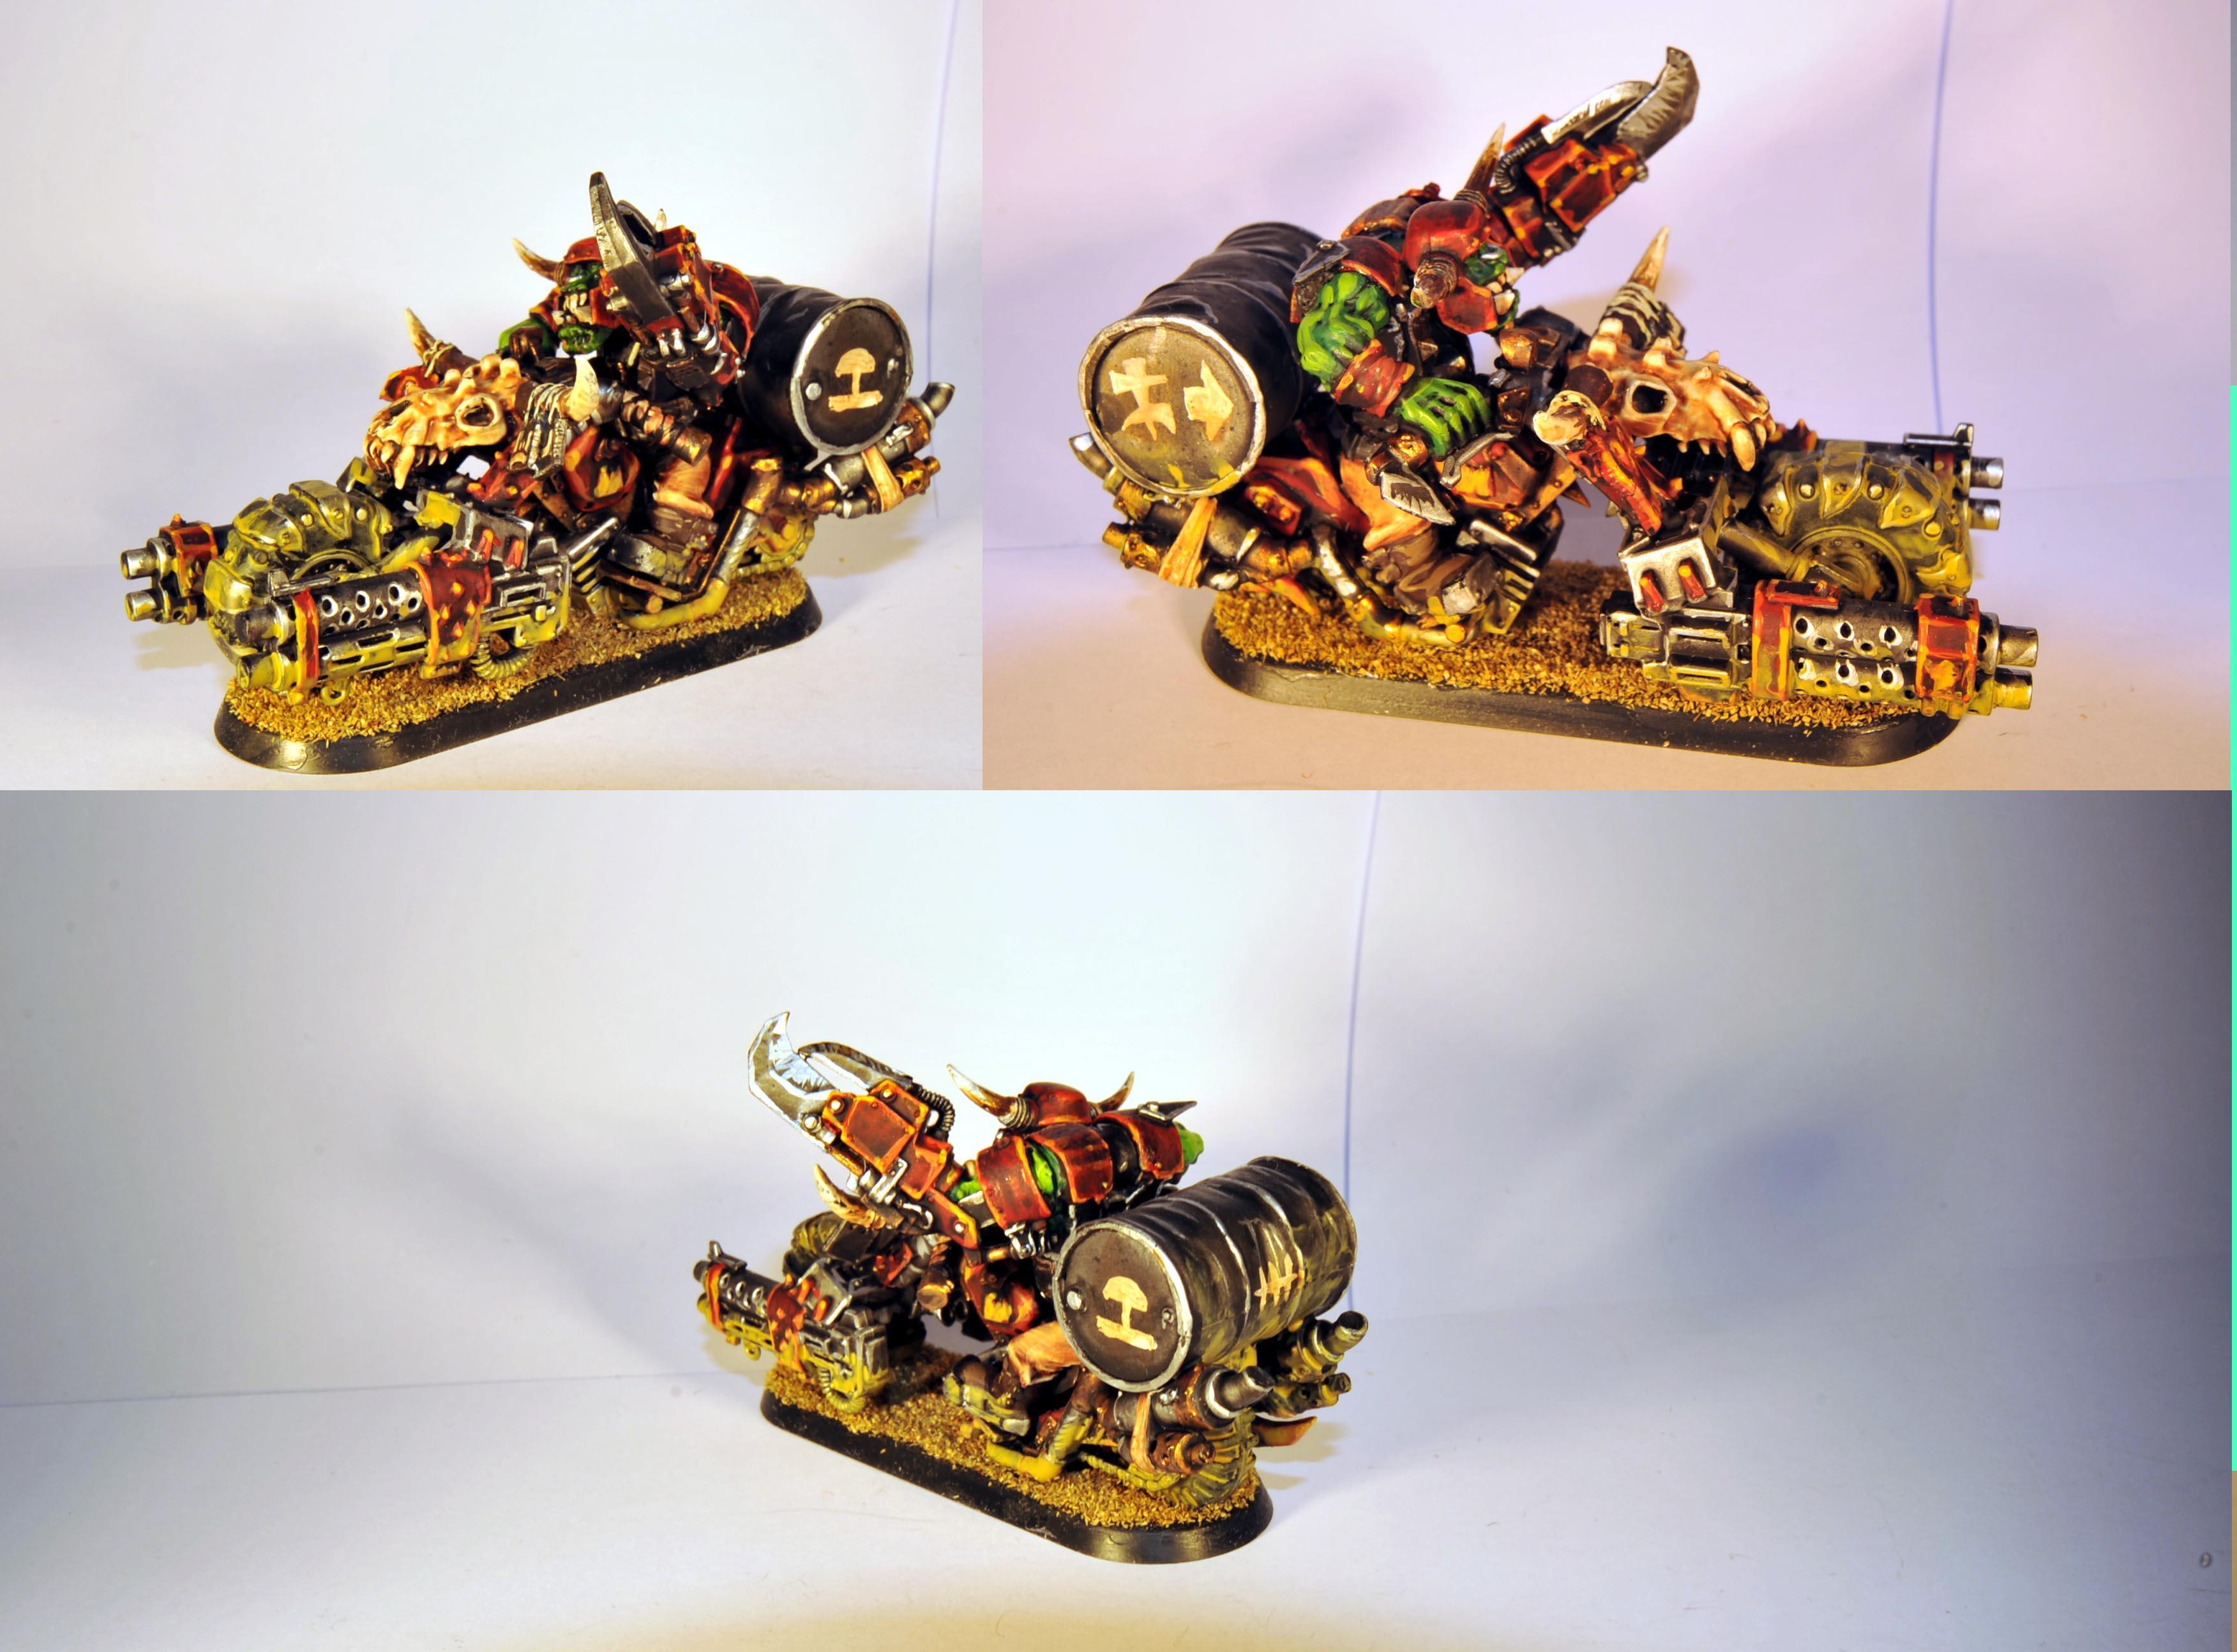 Bike, Evil Sunz, Freaks, Freeks, Nob, Orks, Speed, Warbike